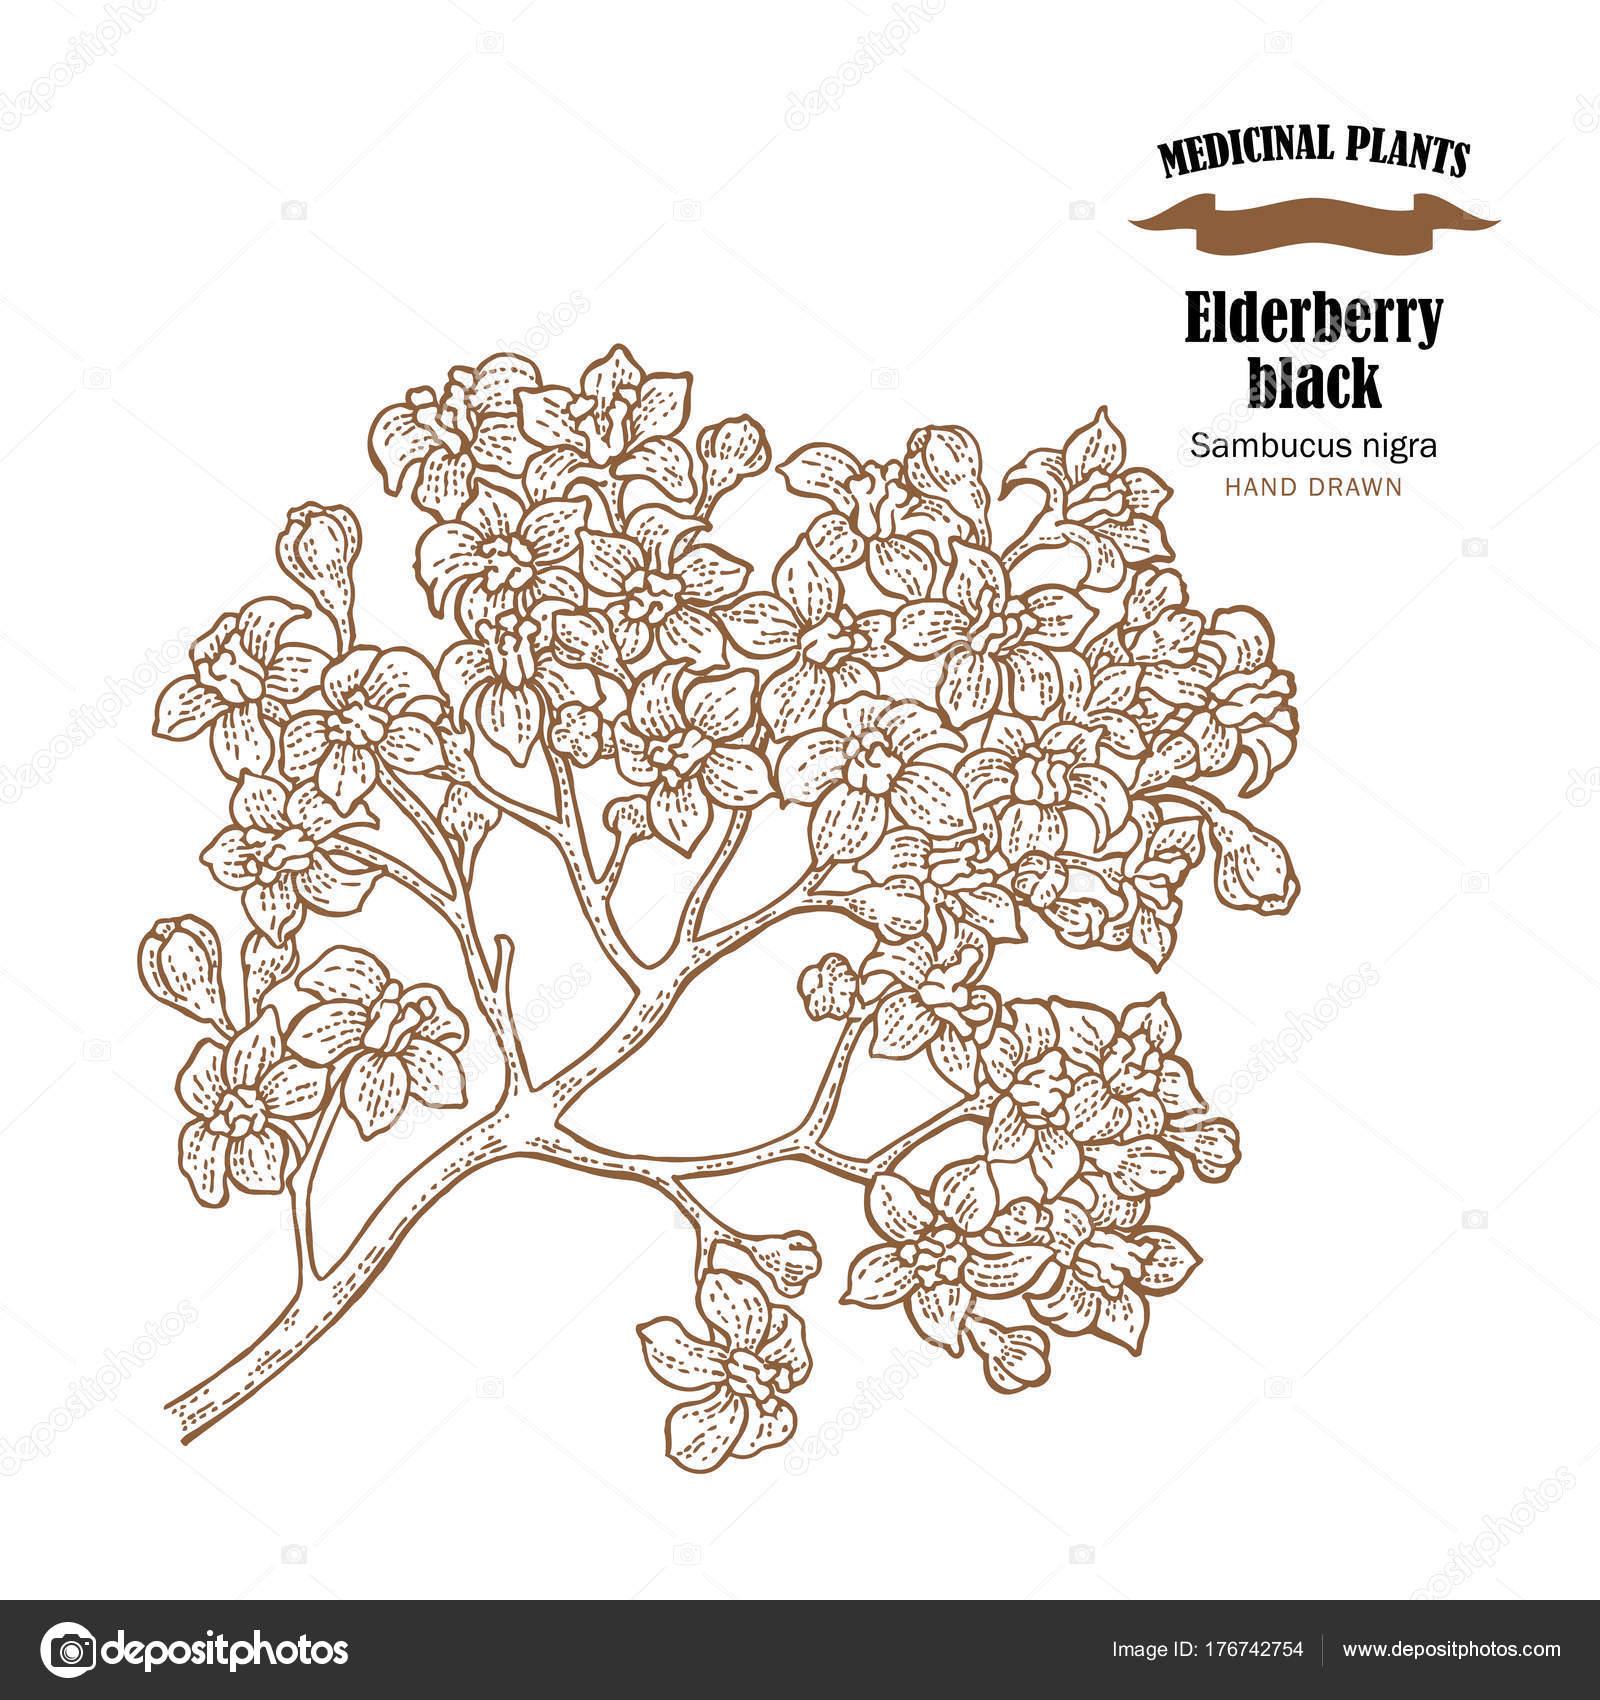 Elderberry black common names sambucus nigra hand drawn elder elderberry black common names sambucus nigra hand drawn elder branch with flowers vector illustration isolated on white background vector by jka mightylinksfo